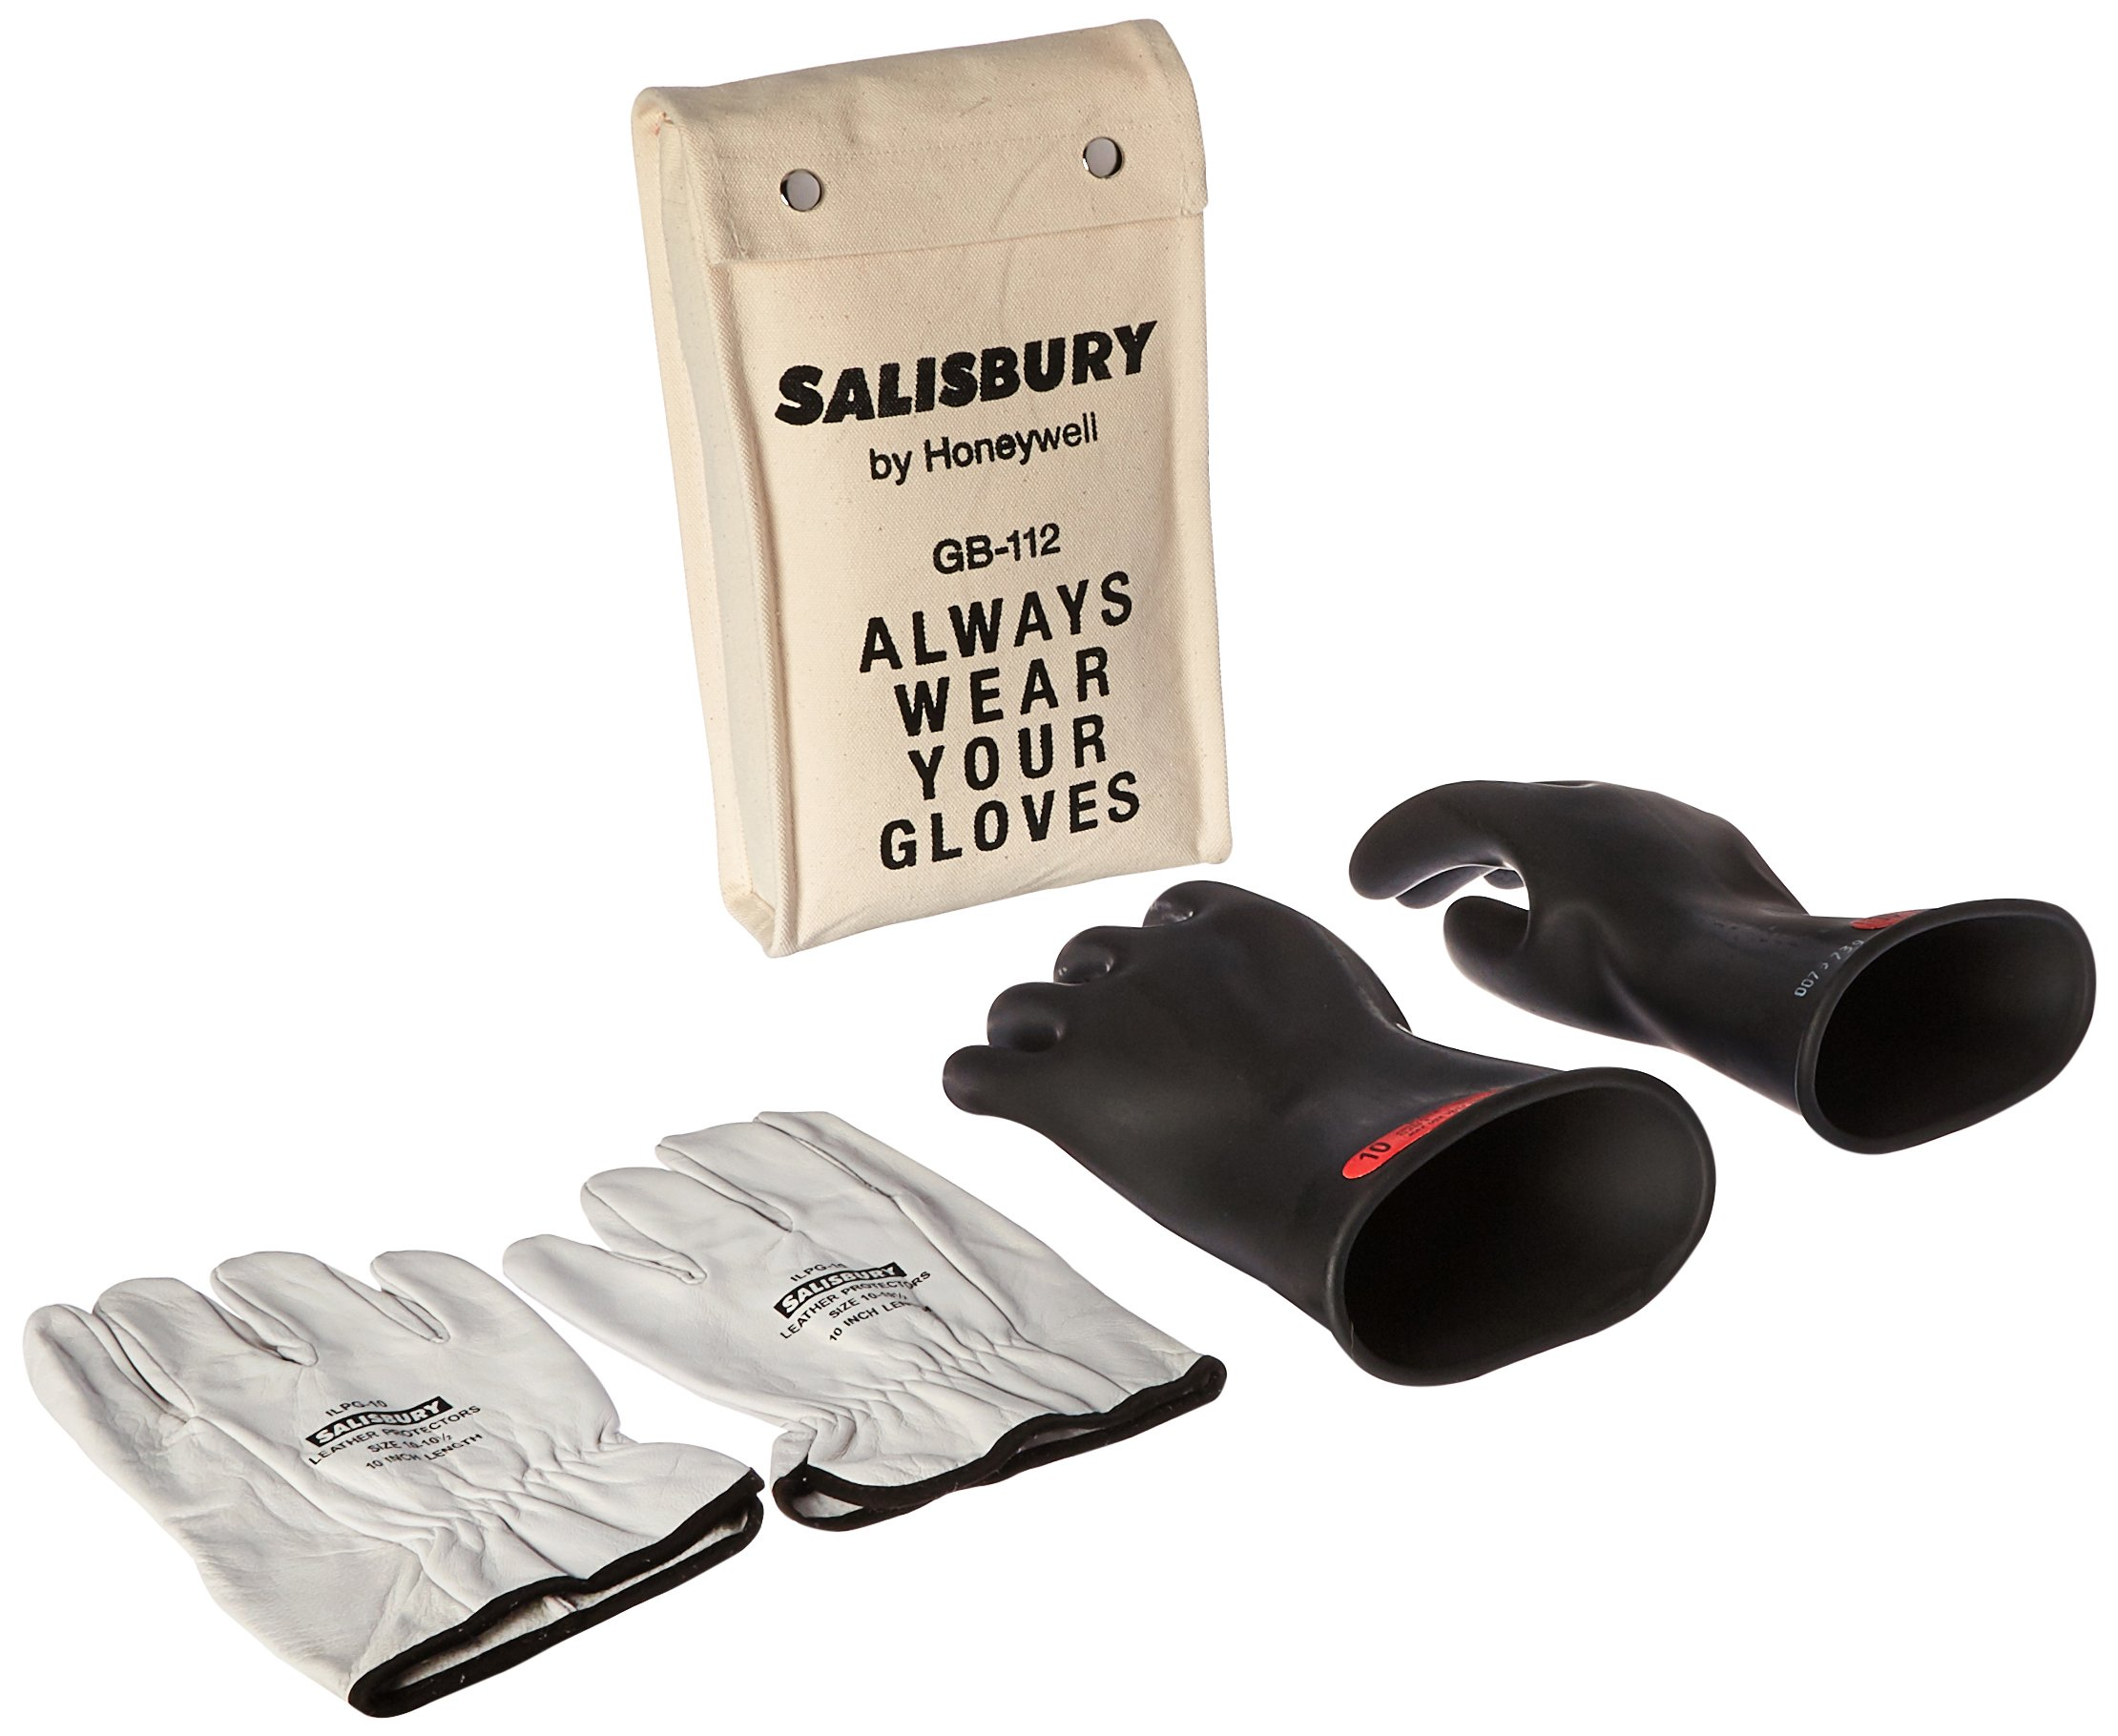 Salisbury by Honeywell GK011B10 Insulated Glove Kit, Class 0, Black, 11''L, Size 10; One Pair